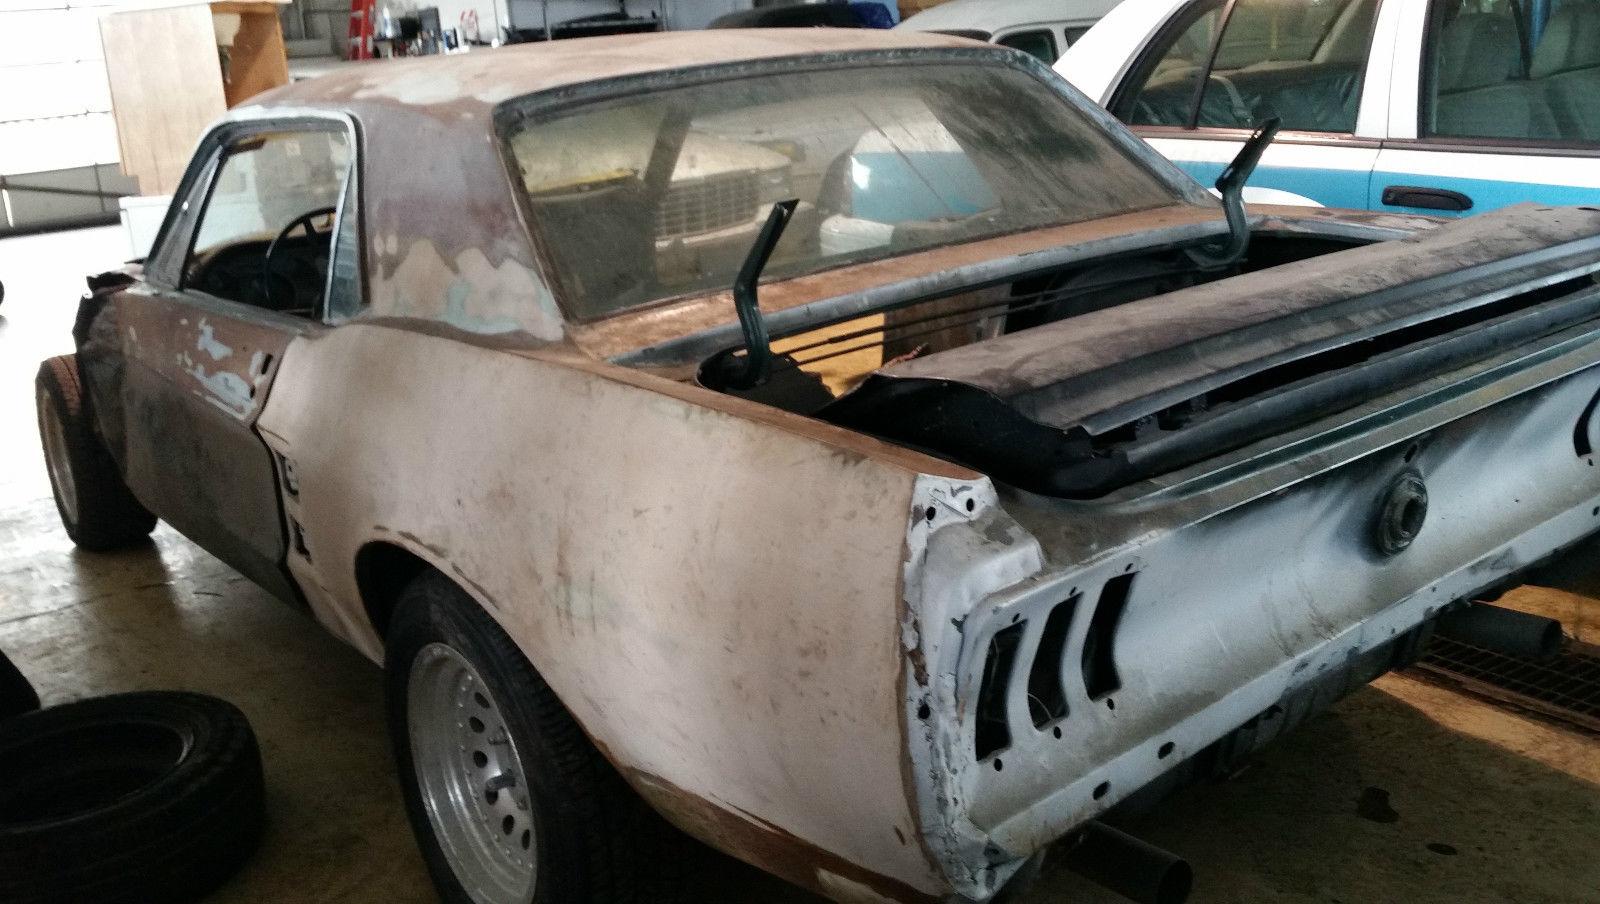 1967 ford mustang v8 project car no reserve for sale in cincinnati ohio united states. Black Bedroom Furniture Sets. Home Design Ideas